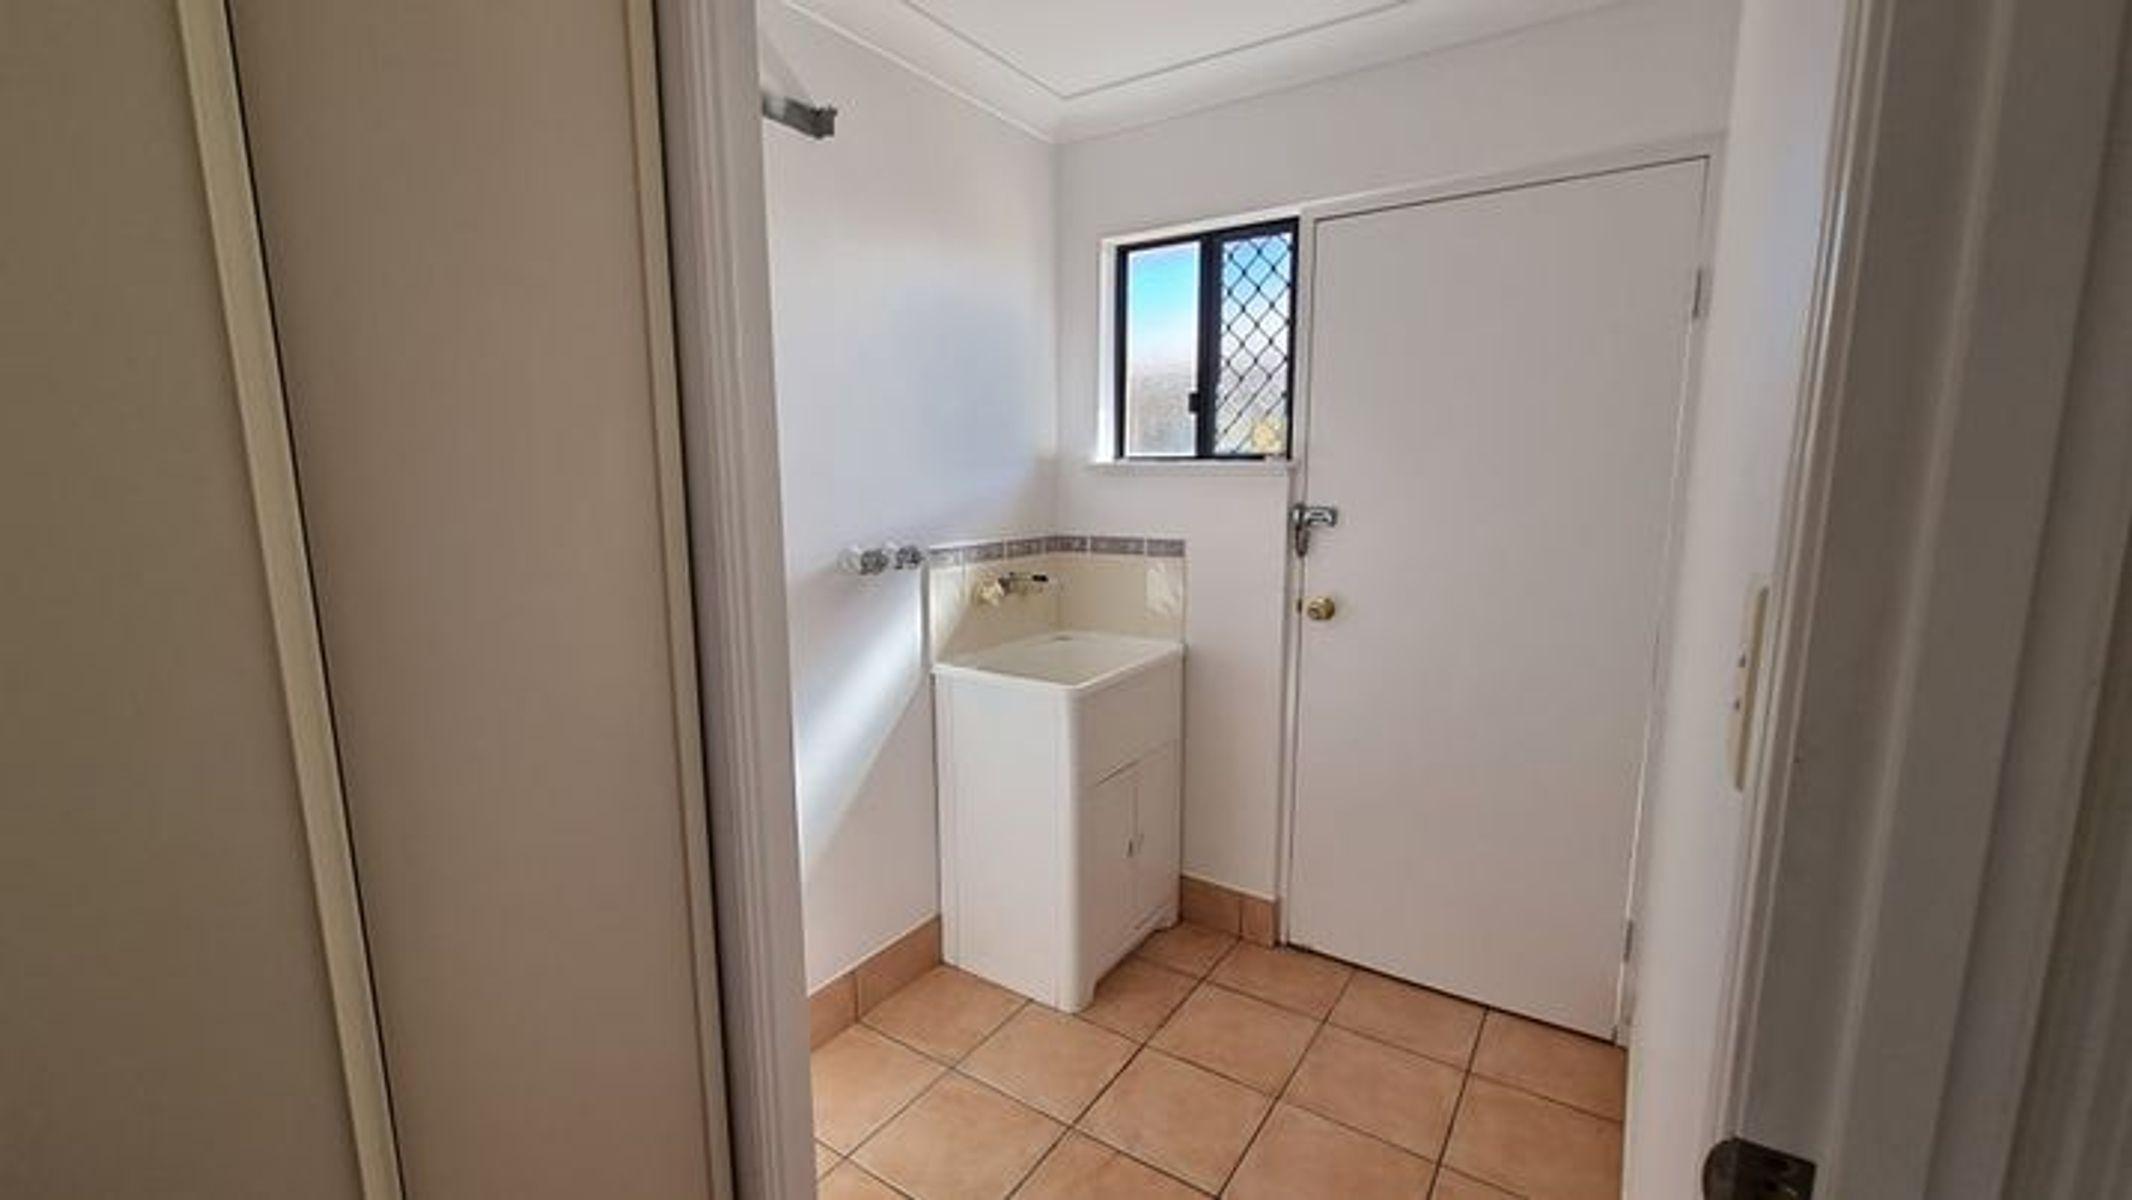 10 Gable Street, Koongal, QLD 4701